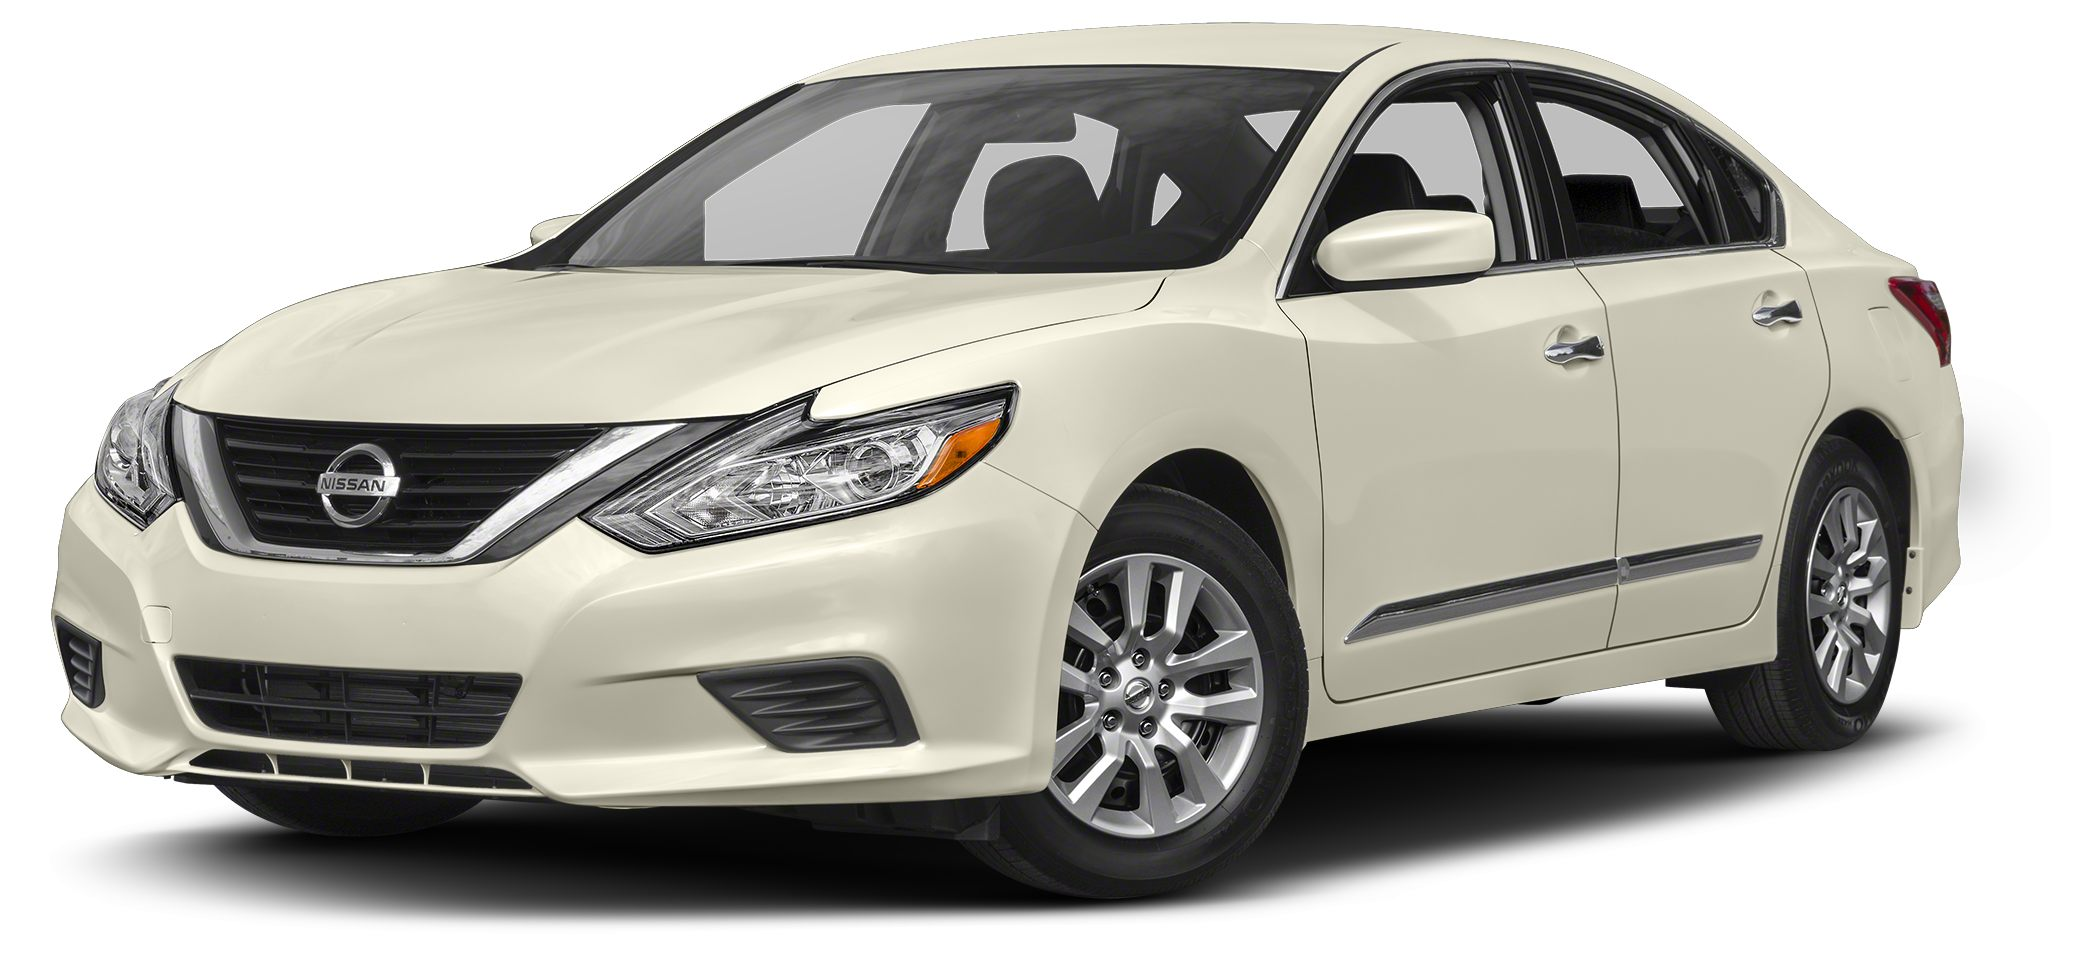 2016 Nissan Altima 25 S Miles 30885Color Pearl White Stock PN17226 VIN 1N4AL3AP2GC176734